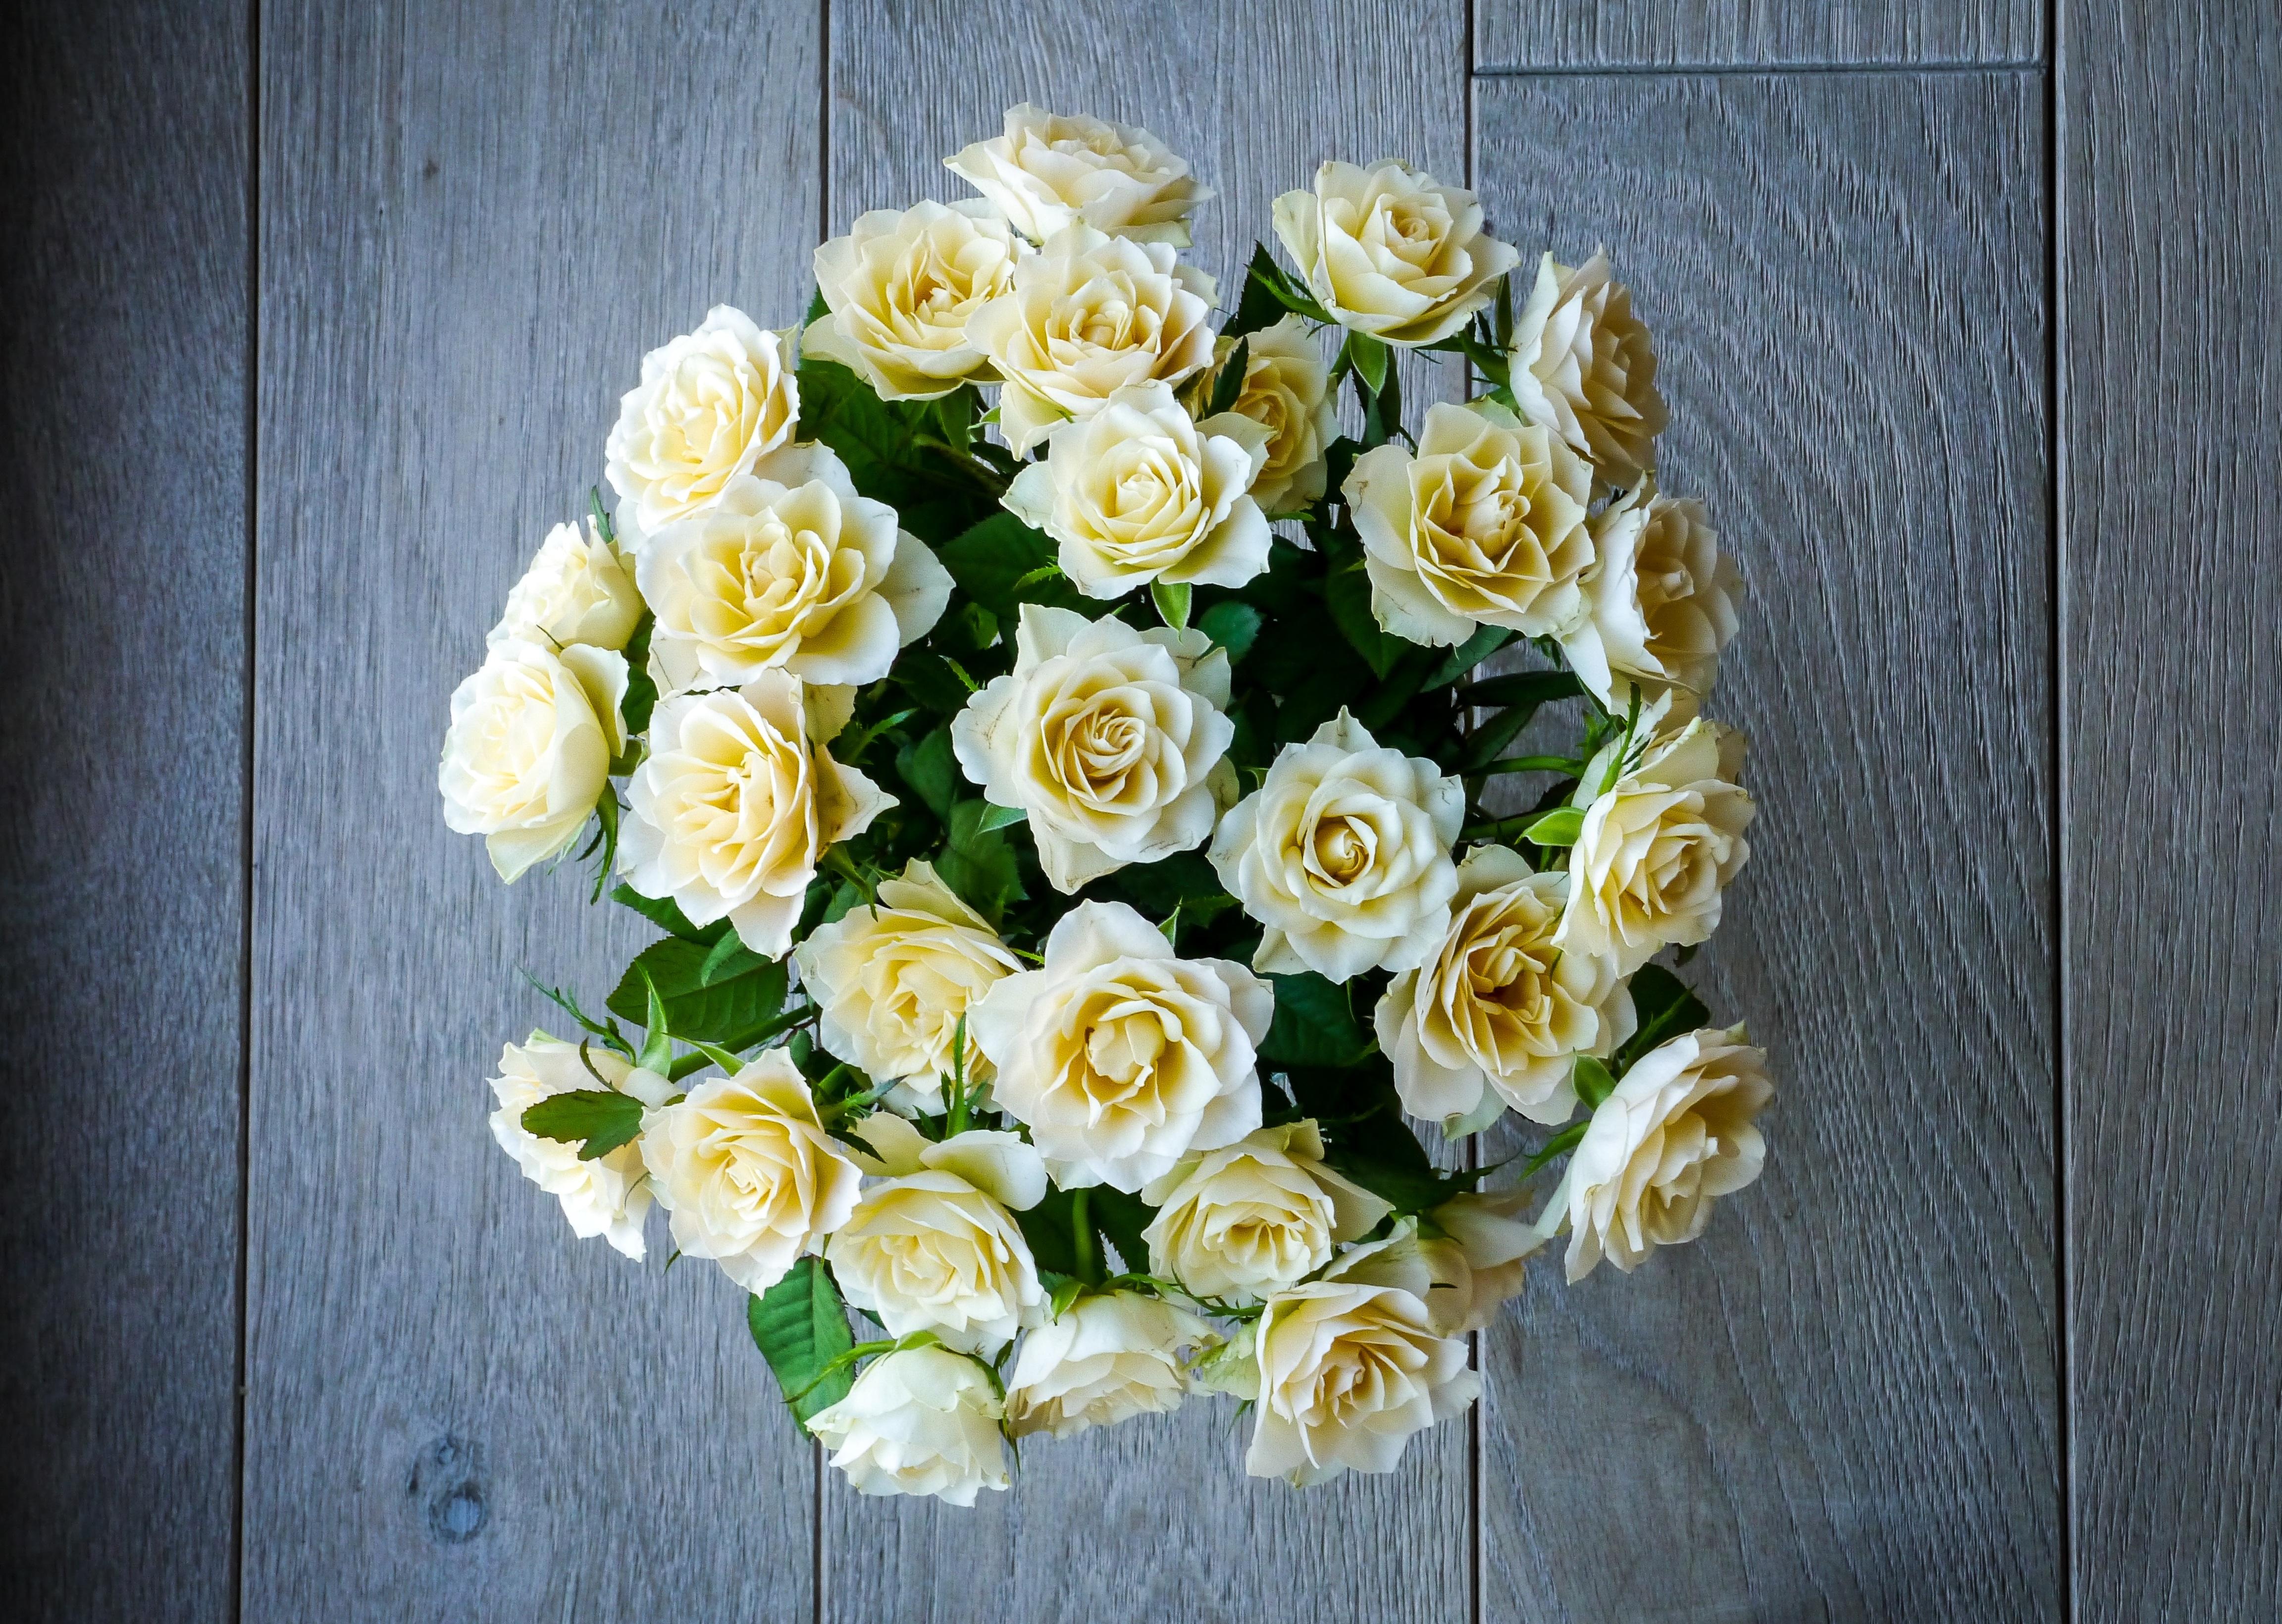 Free Images Blossom White Petal Bloom Love Romance Romantic